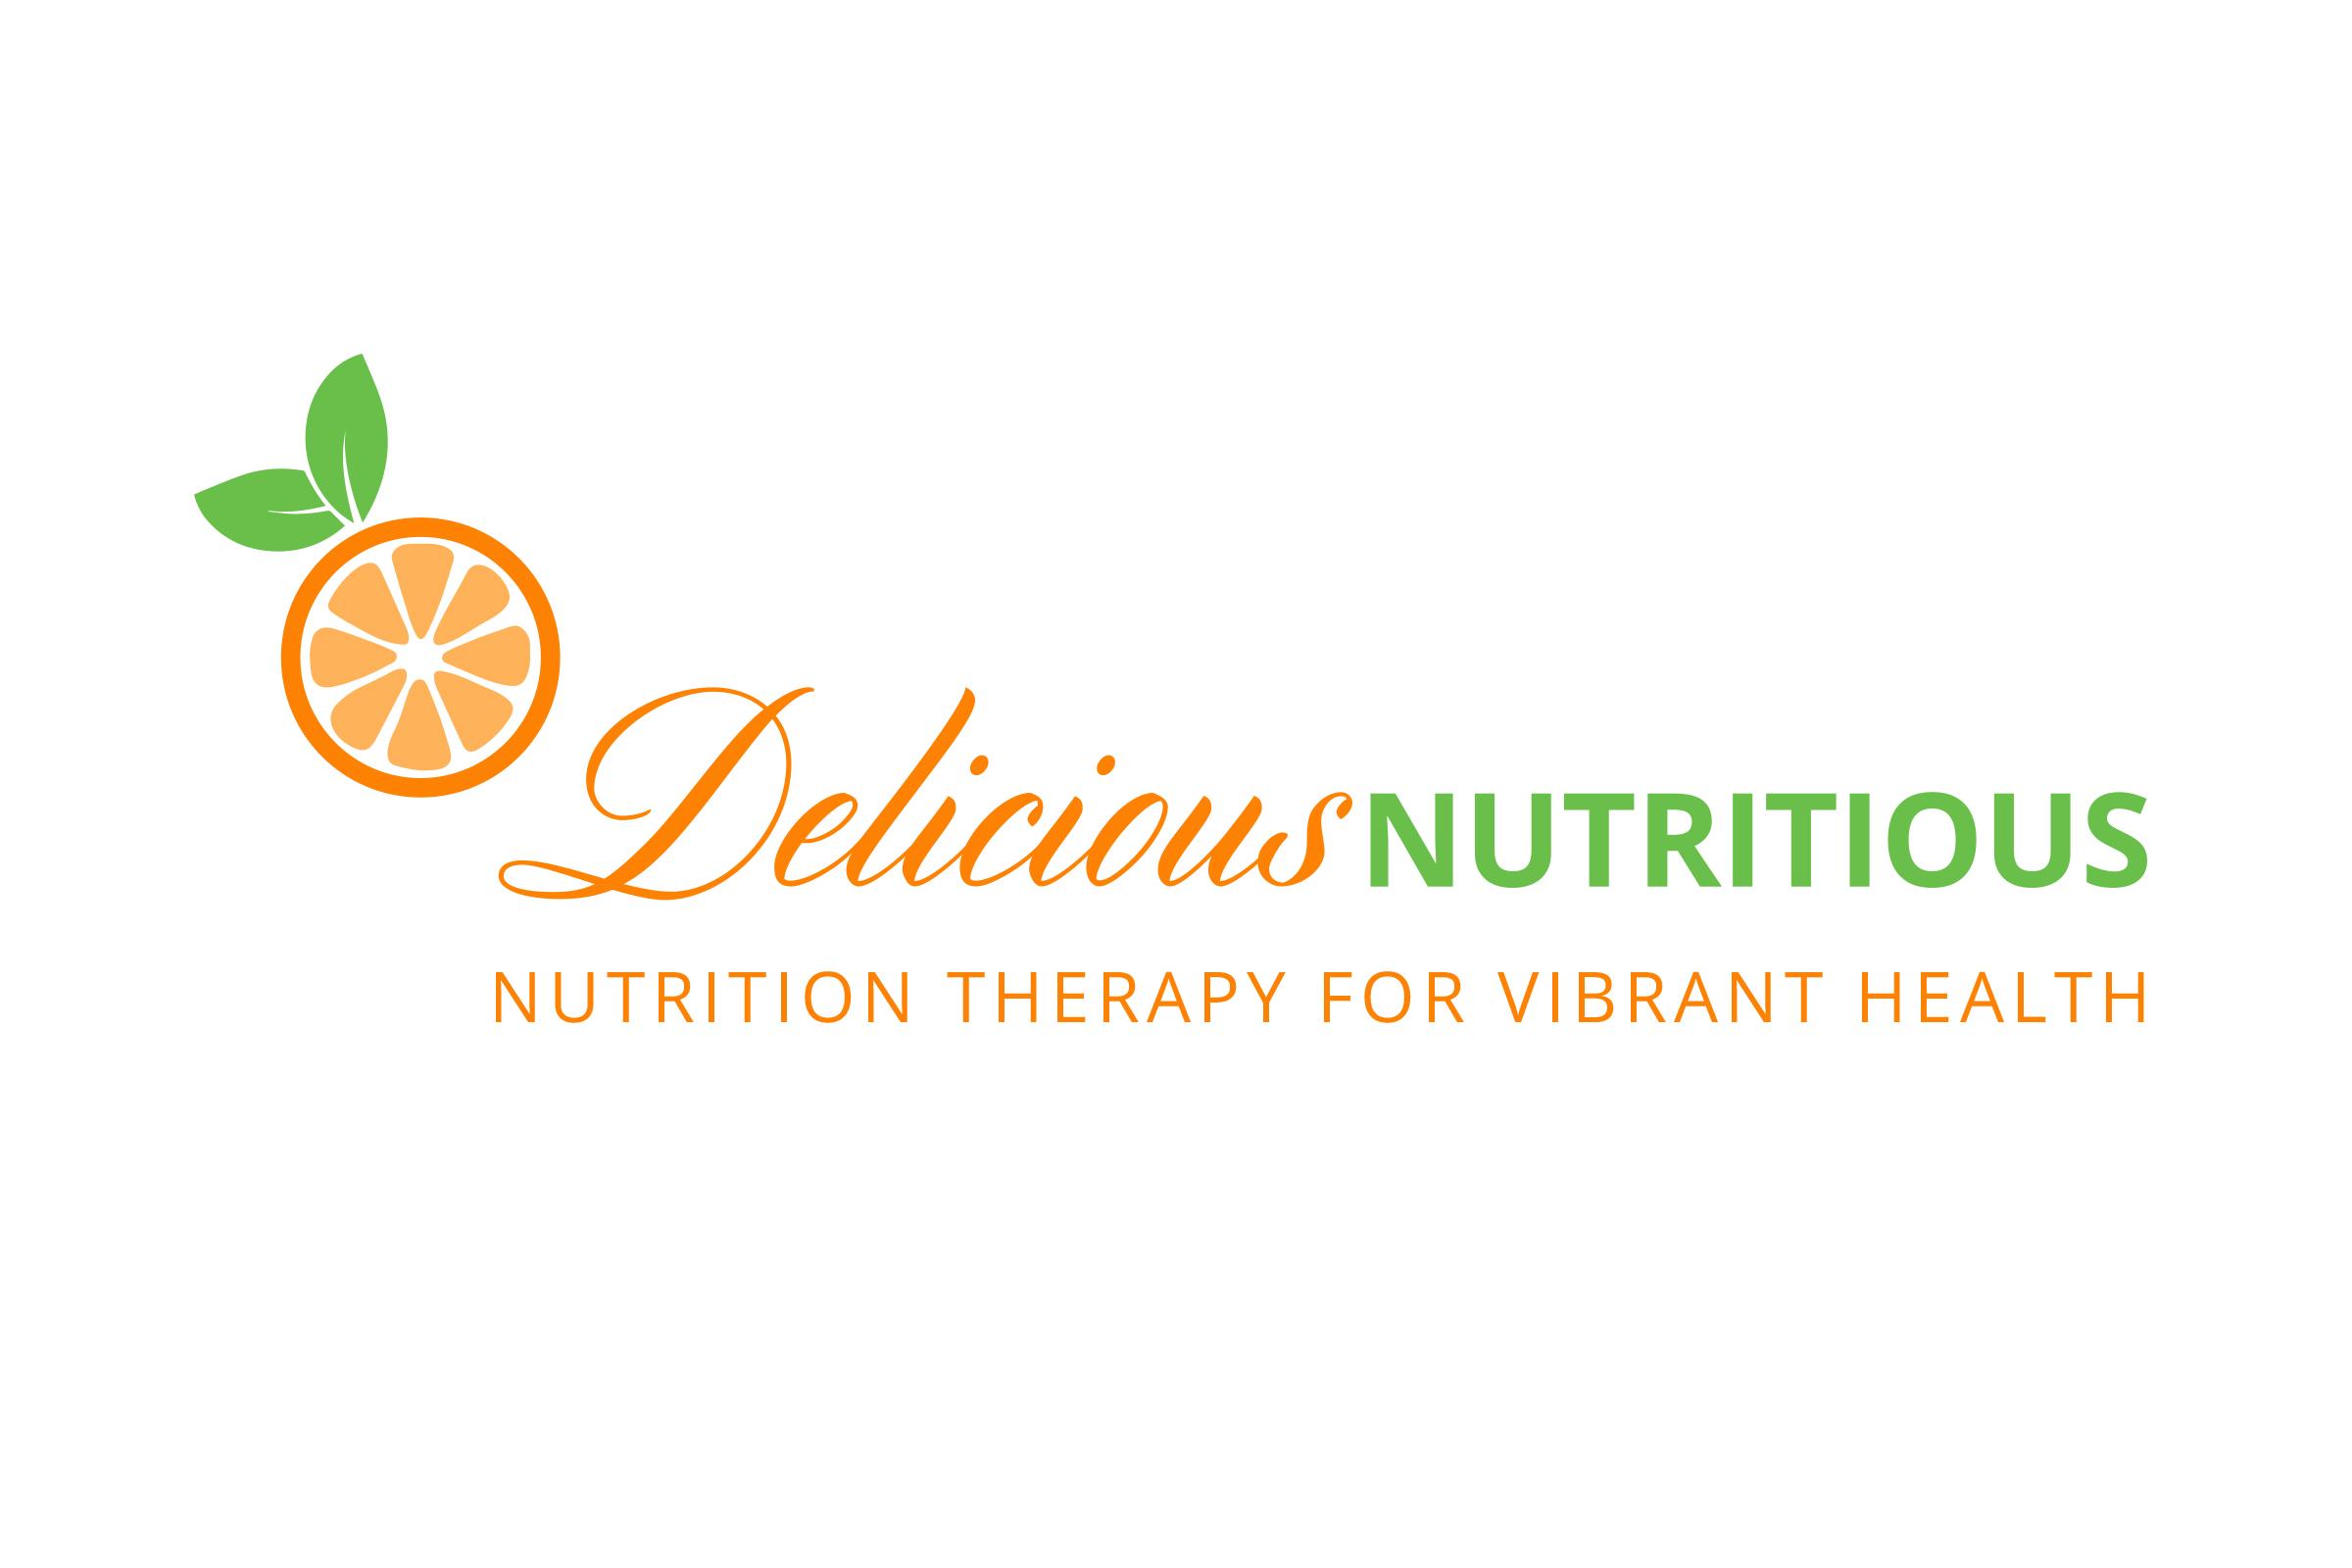 hearthfire-creative-logo-brand-identity-designer-denver-colorado-delicious-nutritious-3.jpg